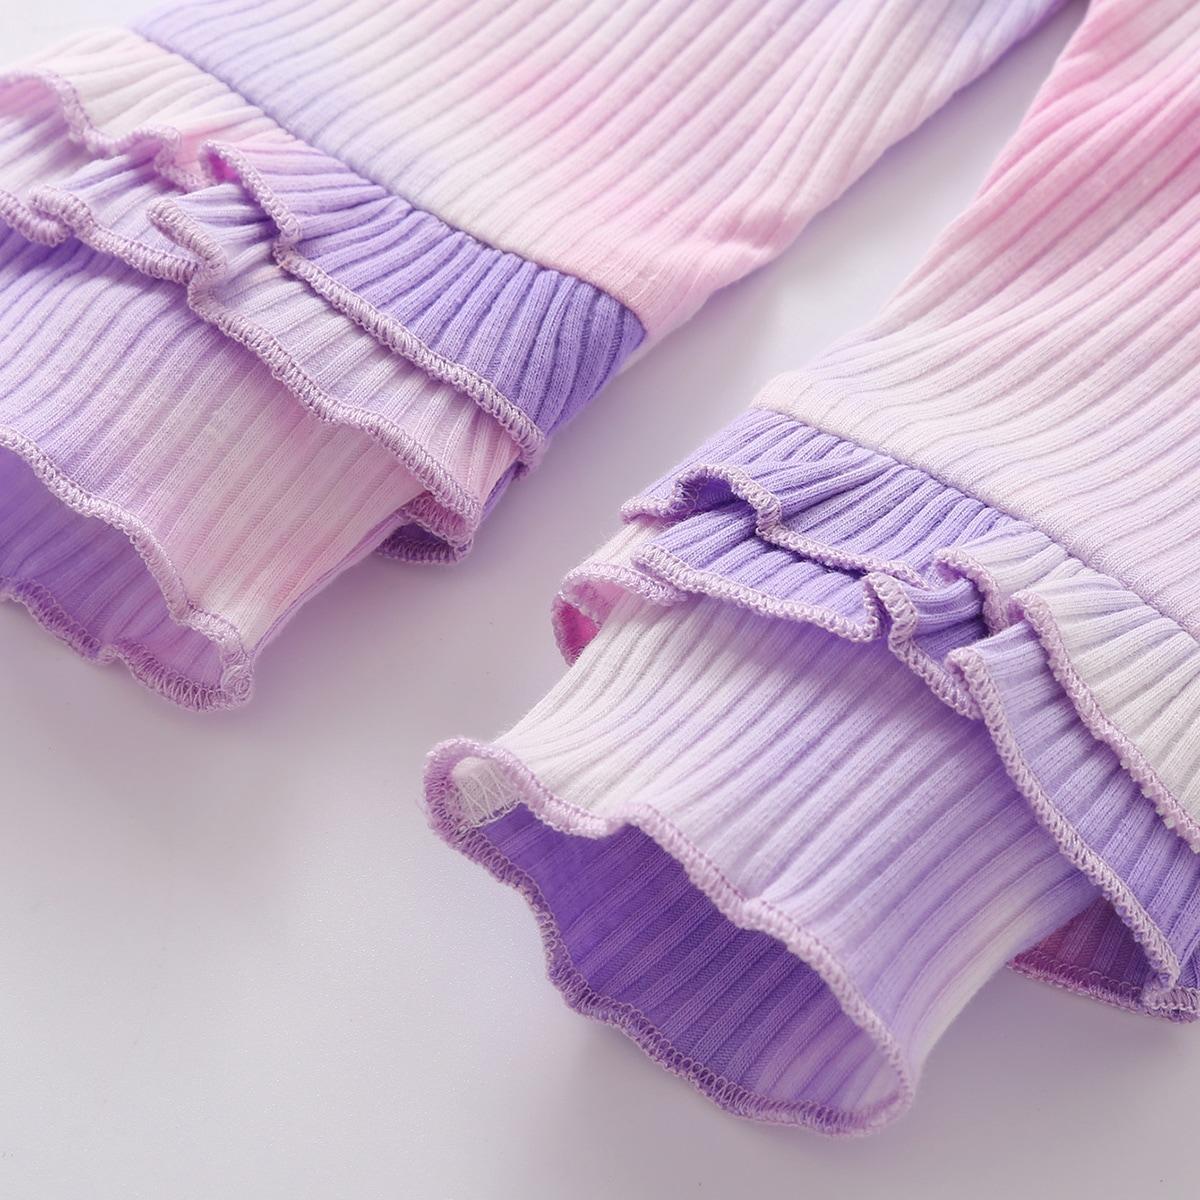 shein Schattig Tie dye Baby-setjes Rimpeling